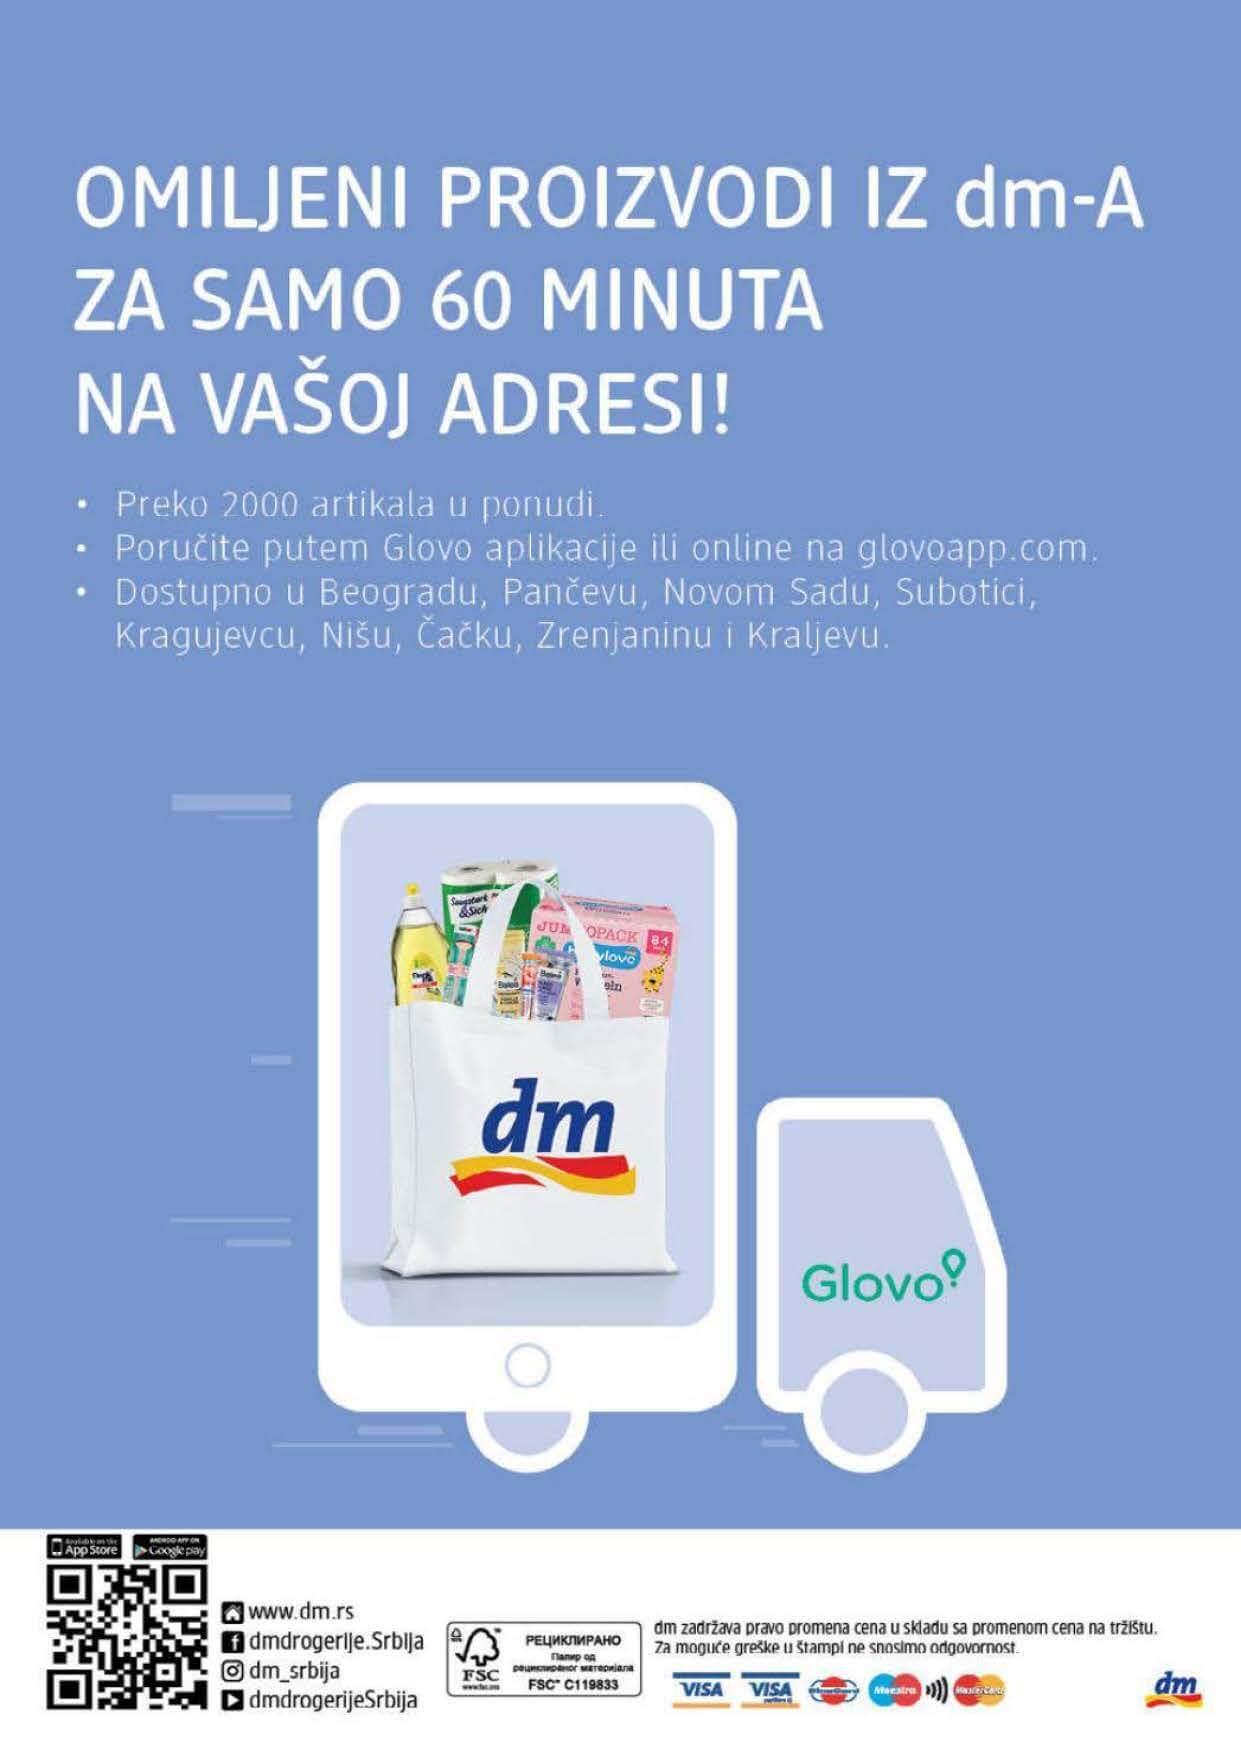 DM Katalog Srbija SEPTEMBAR 2021 1.9.2021. 30.9.2021. Page 40